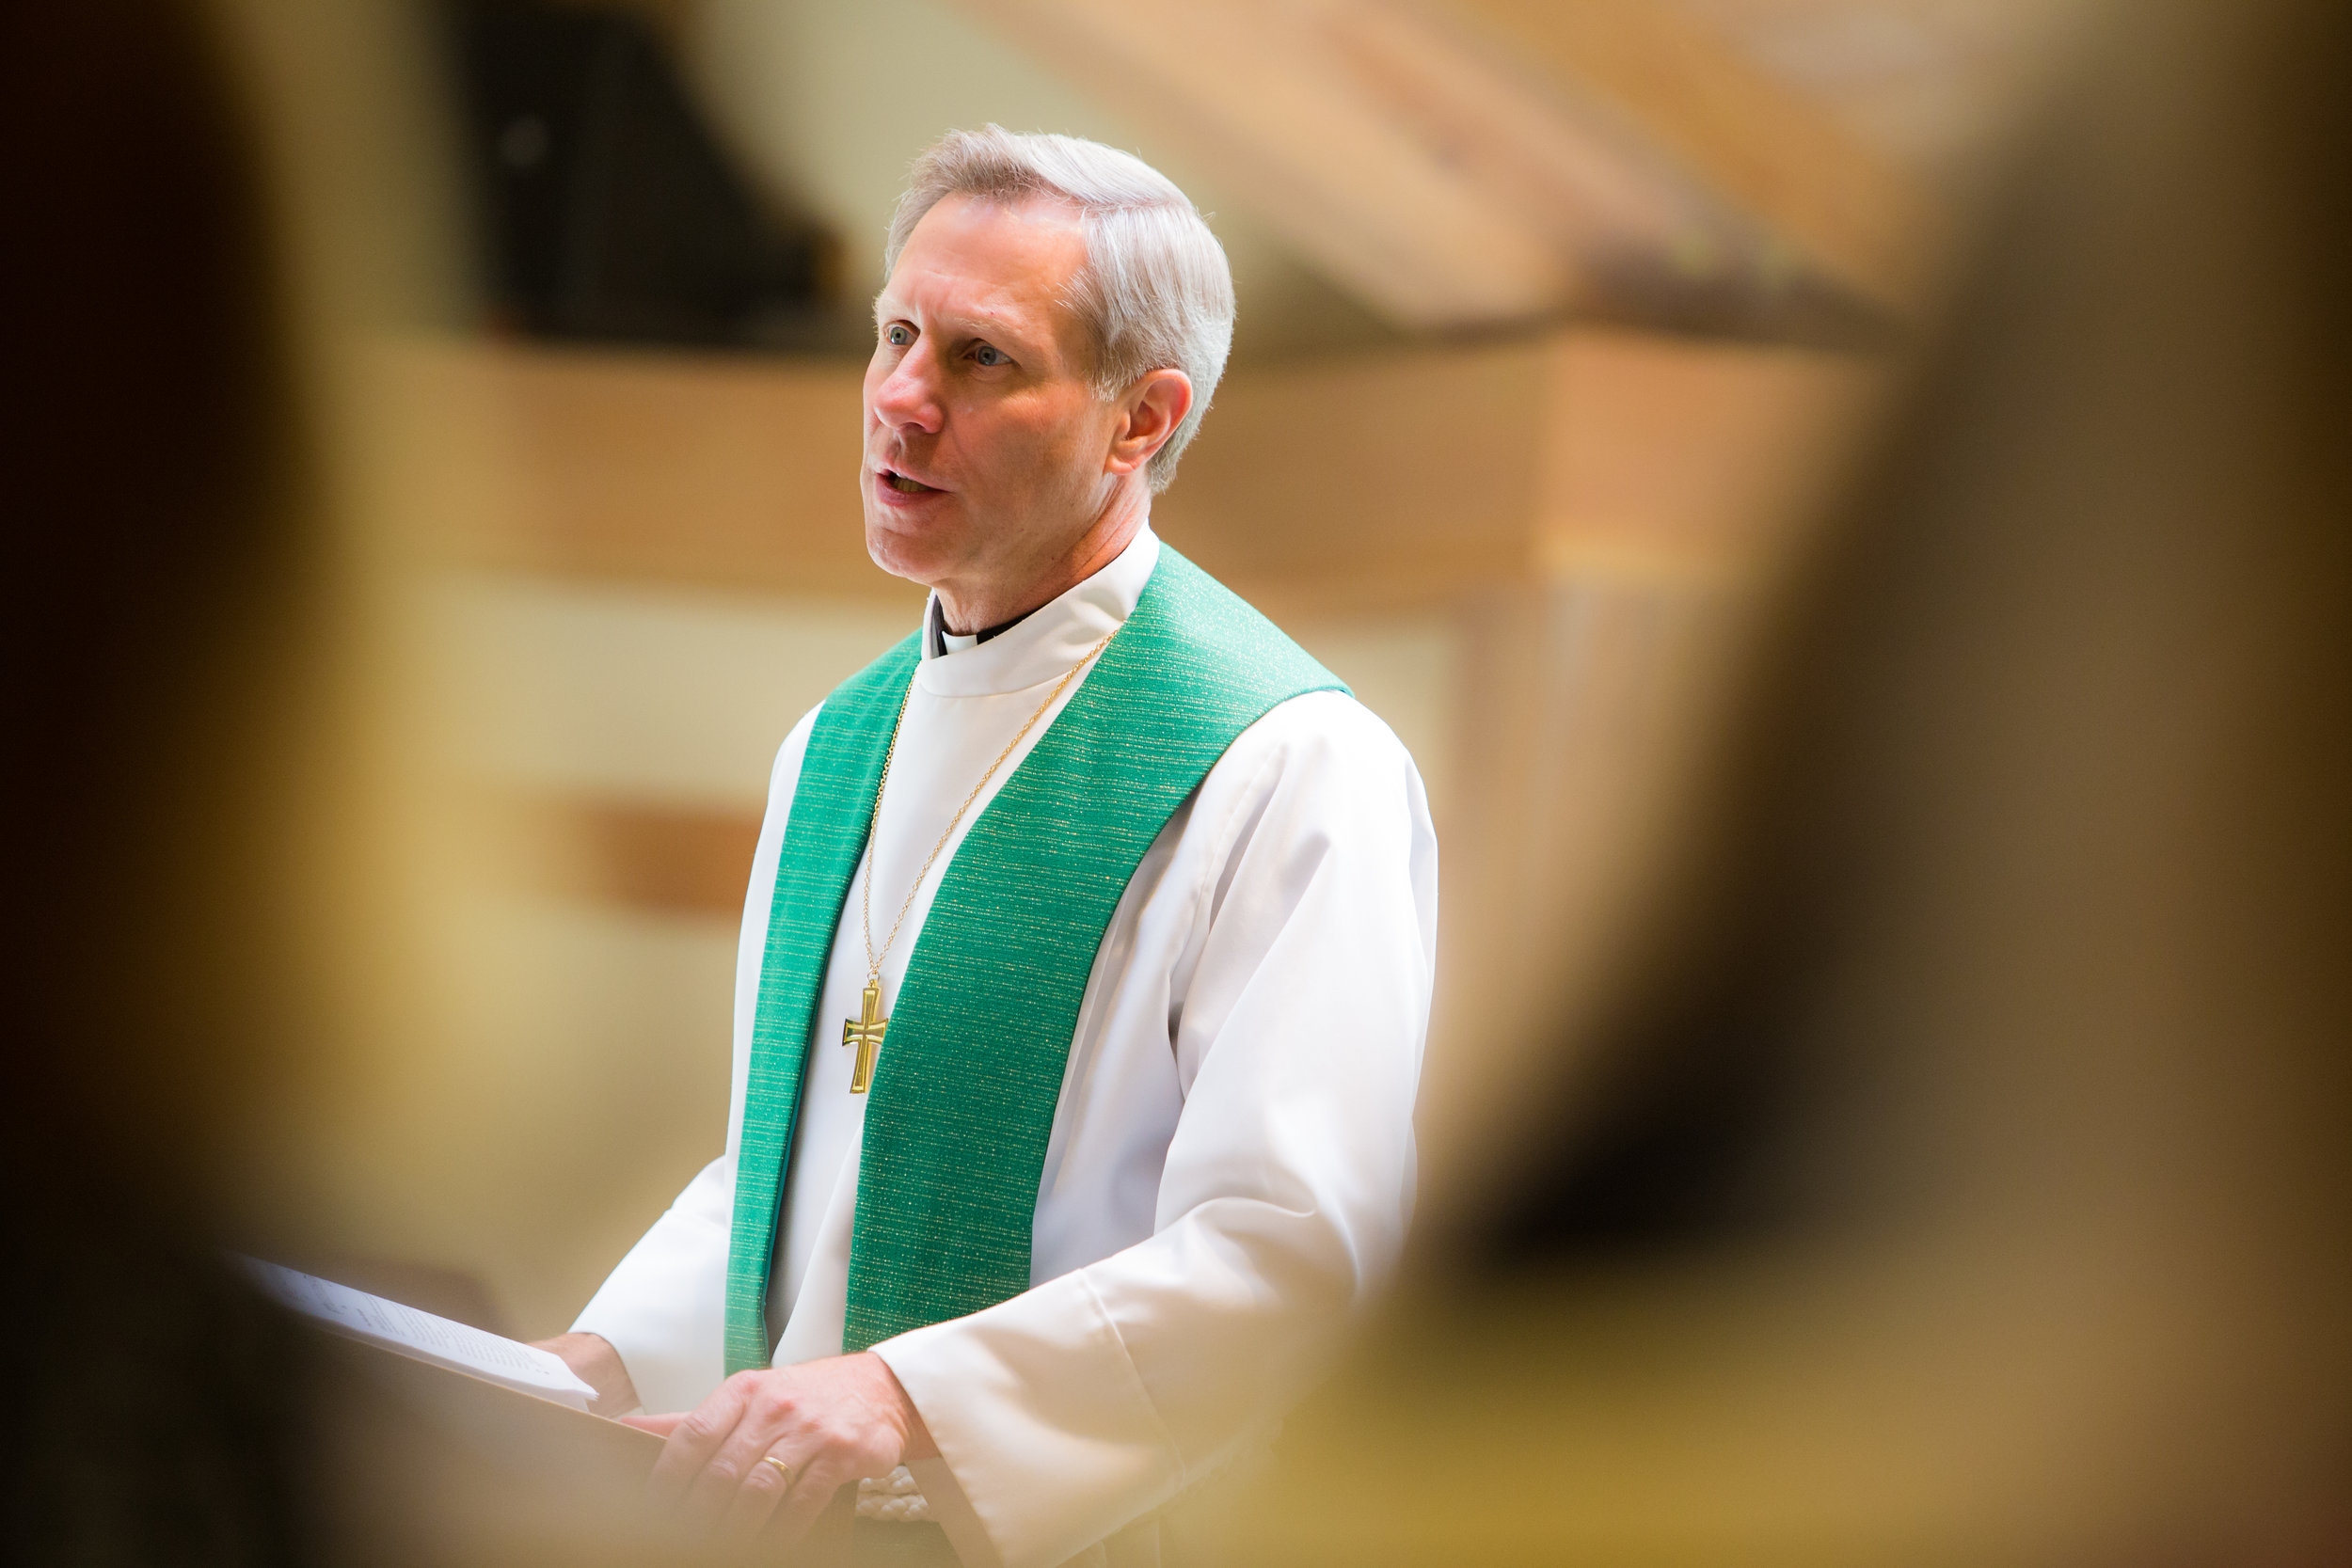 Pastor Mike Teaching